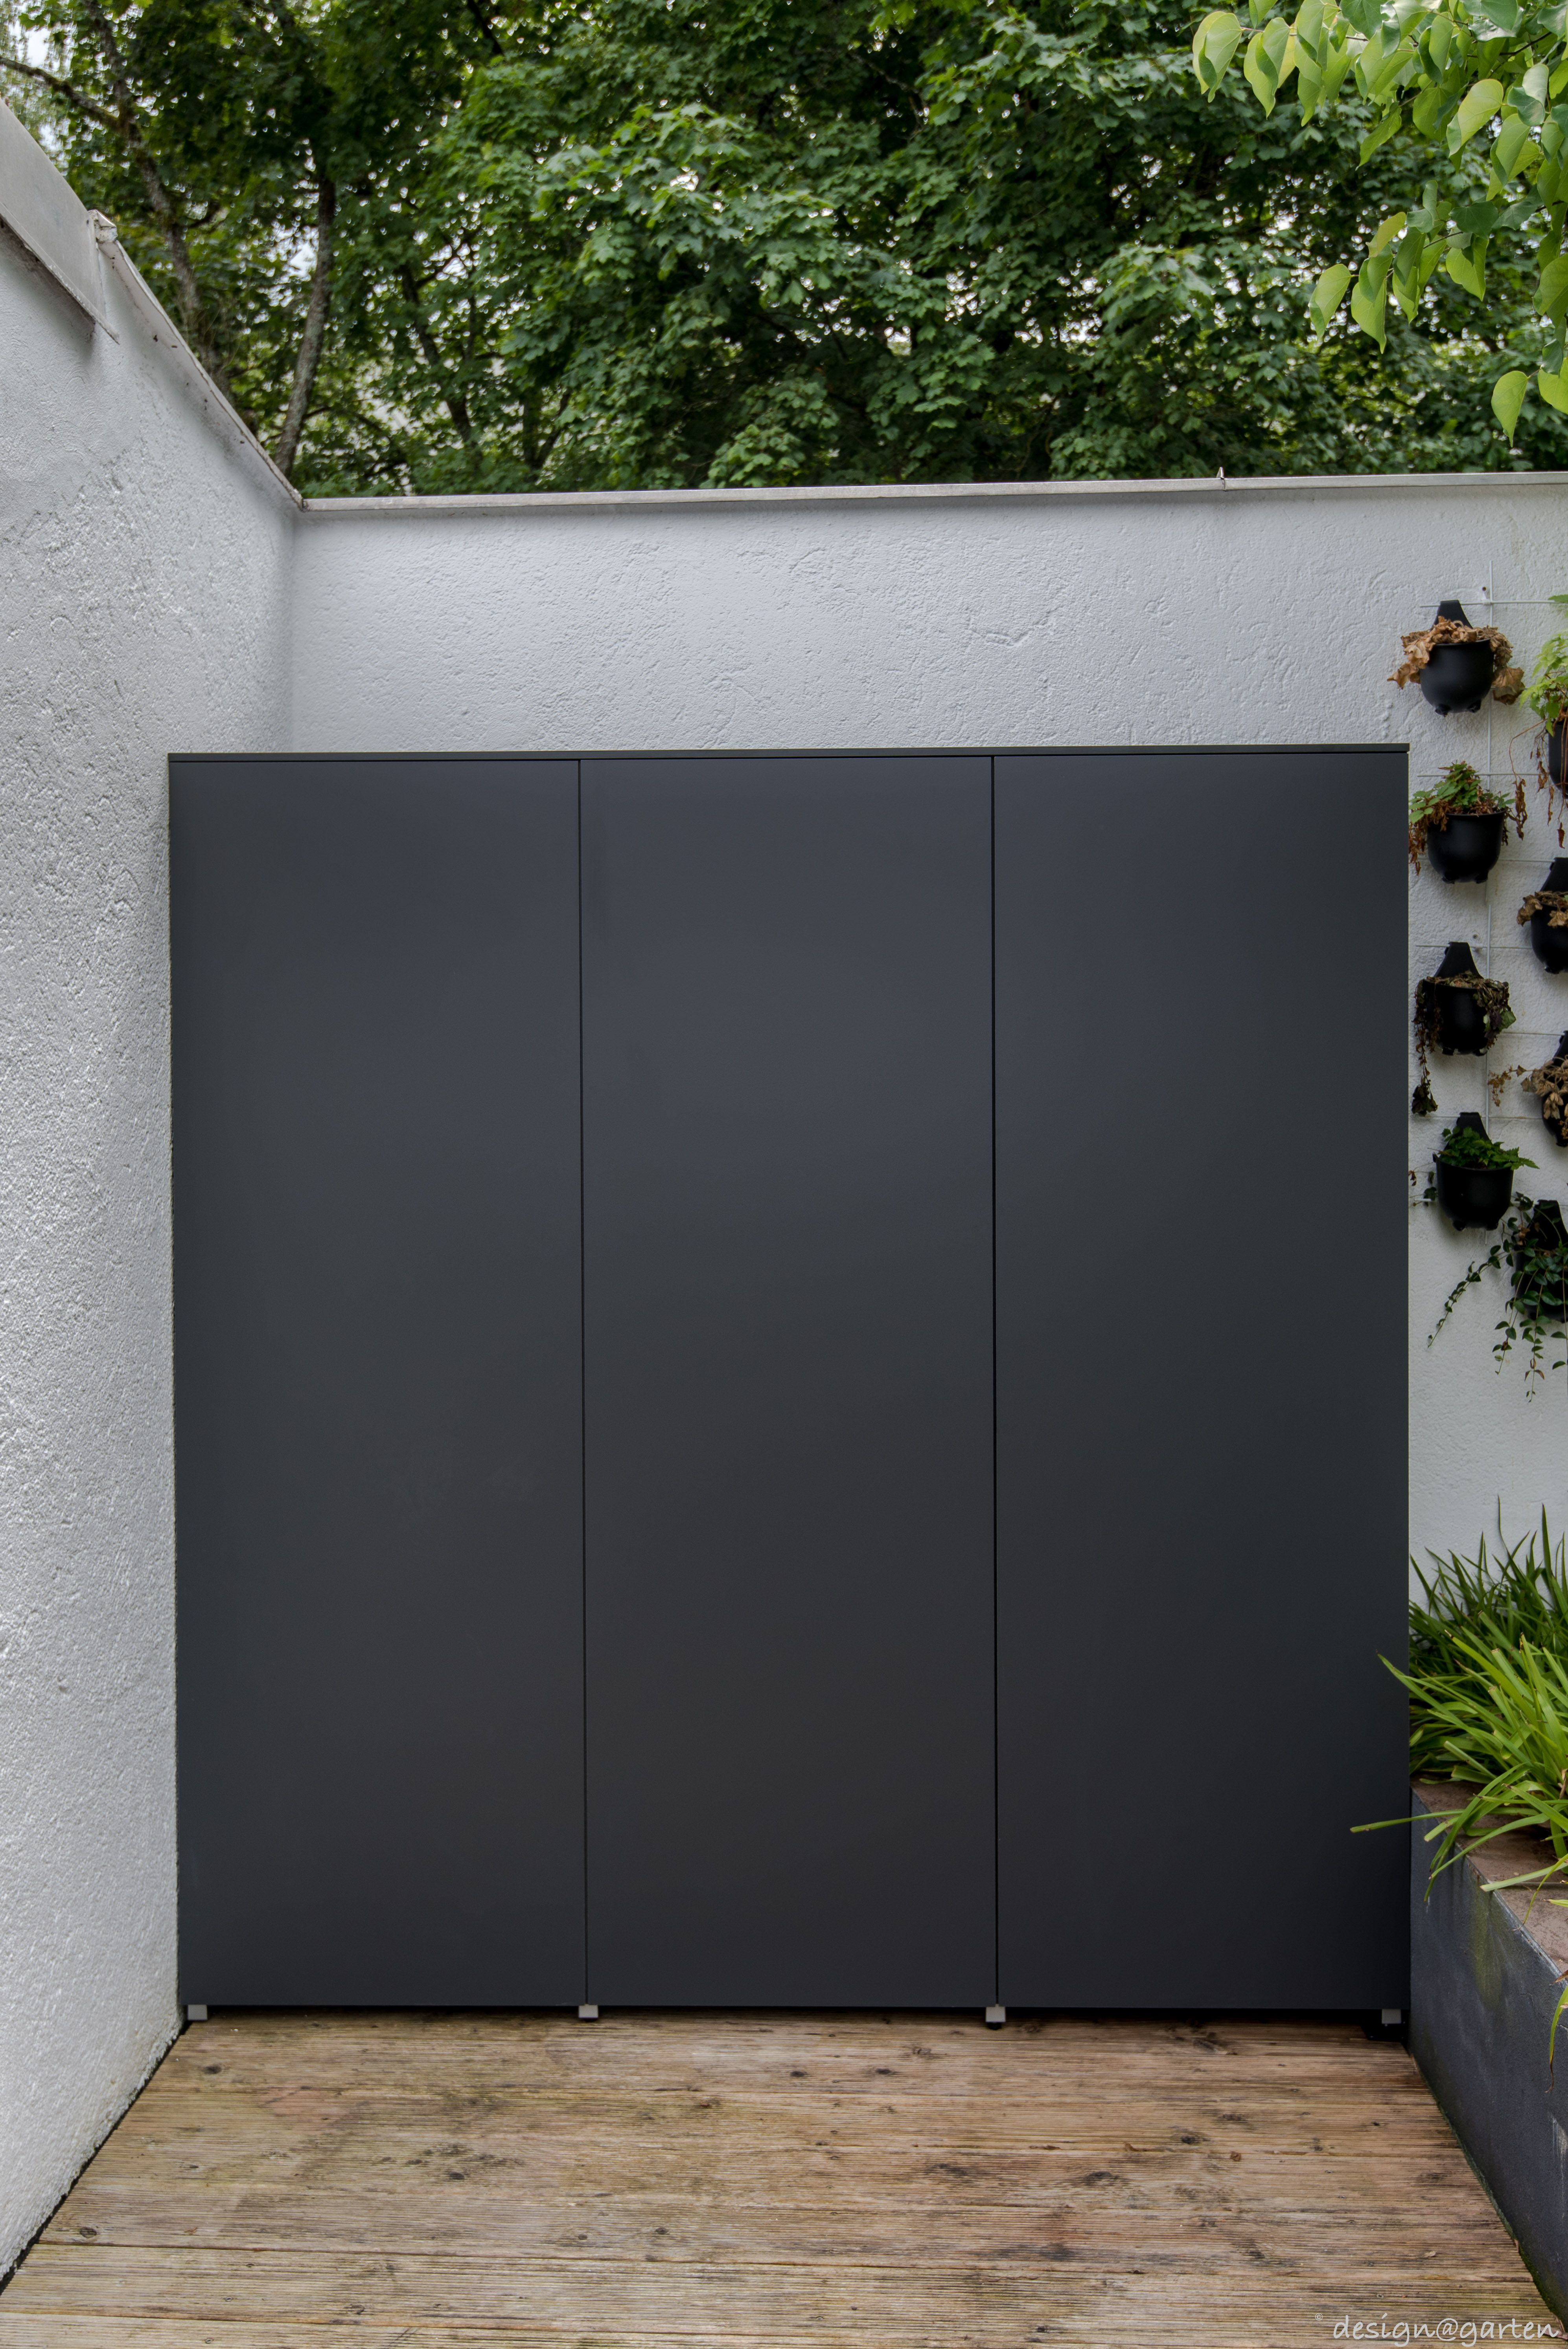 Terrassenschrank Balkonschrank Nach Mass By Design Garten Augsburg In Munchen Solln Uv Bestandig Wetterfest Winner Gartenschrank Terassenideen Garten